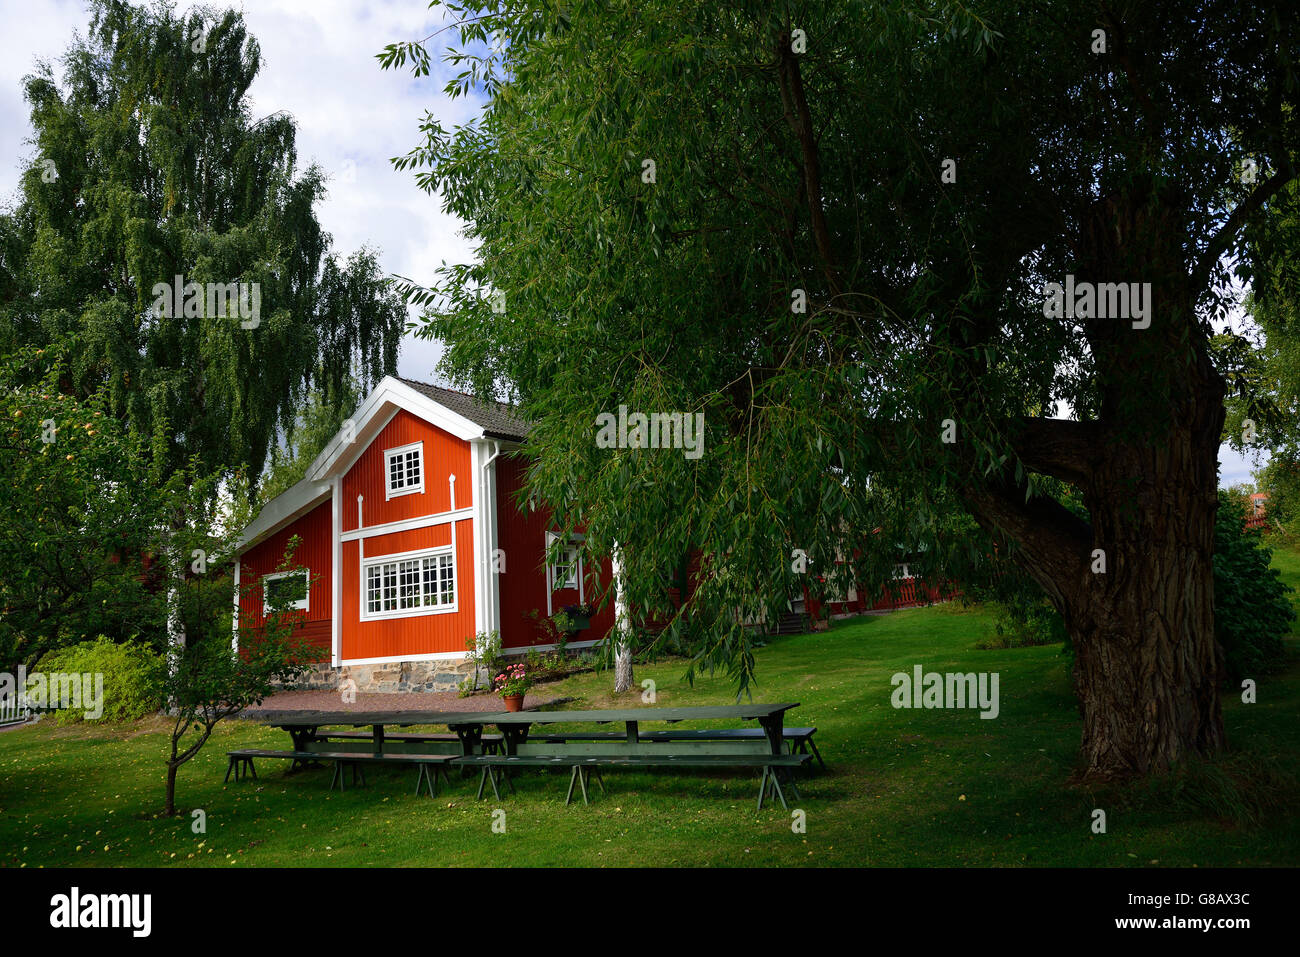 residential house of the painter Carl Larsson, Sundborn, Dalarna, Sweden - Stock Image